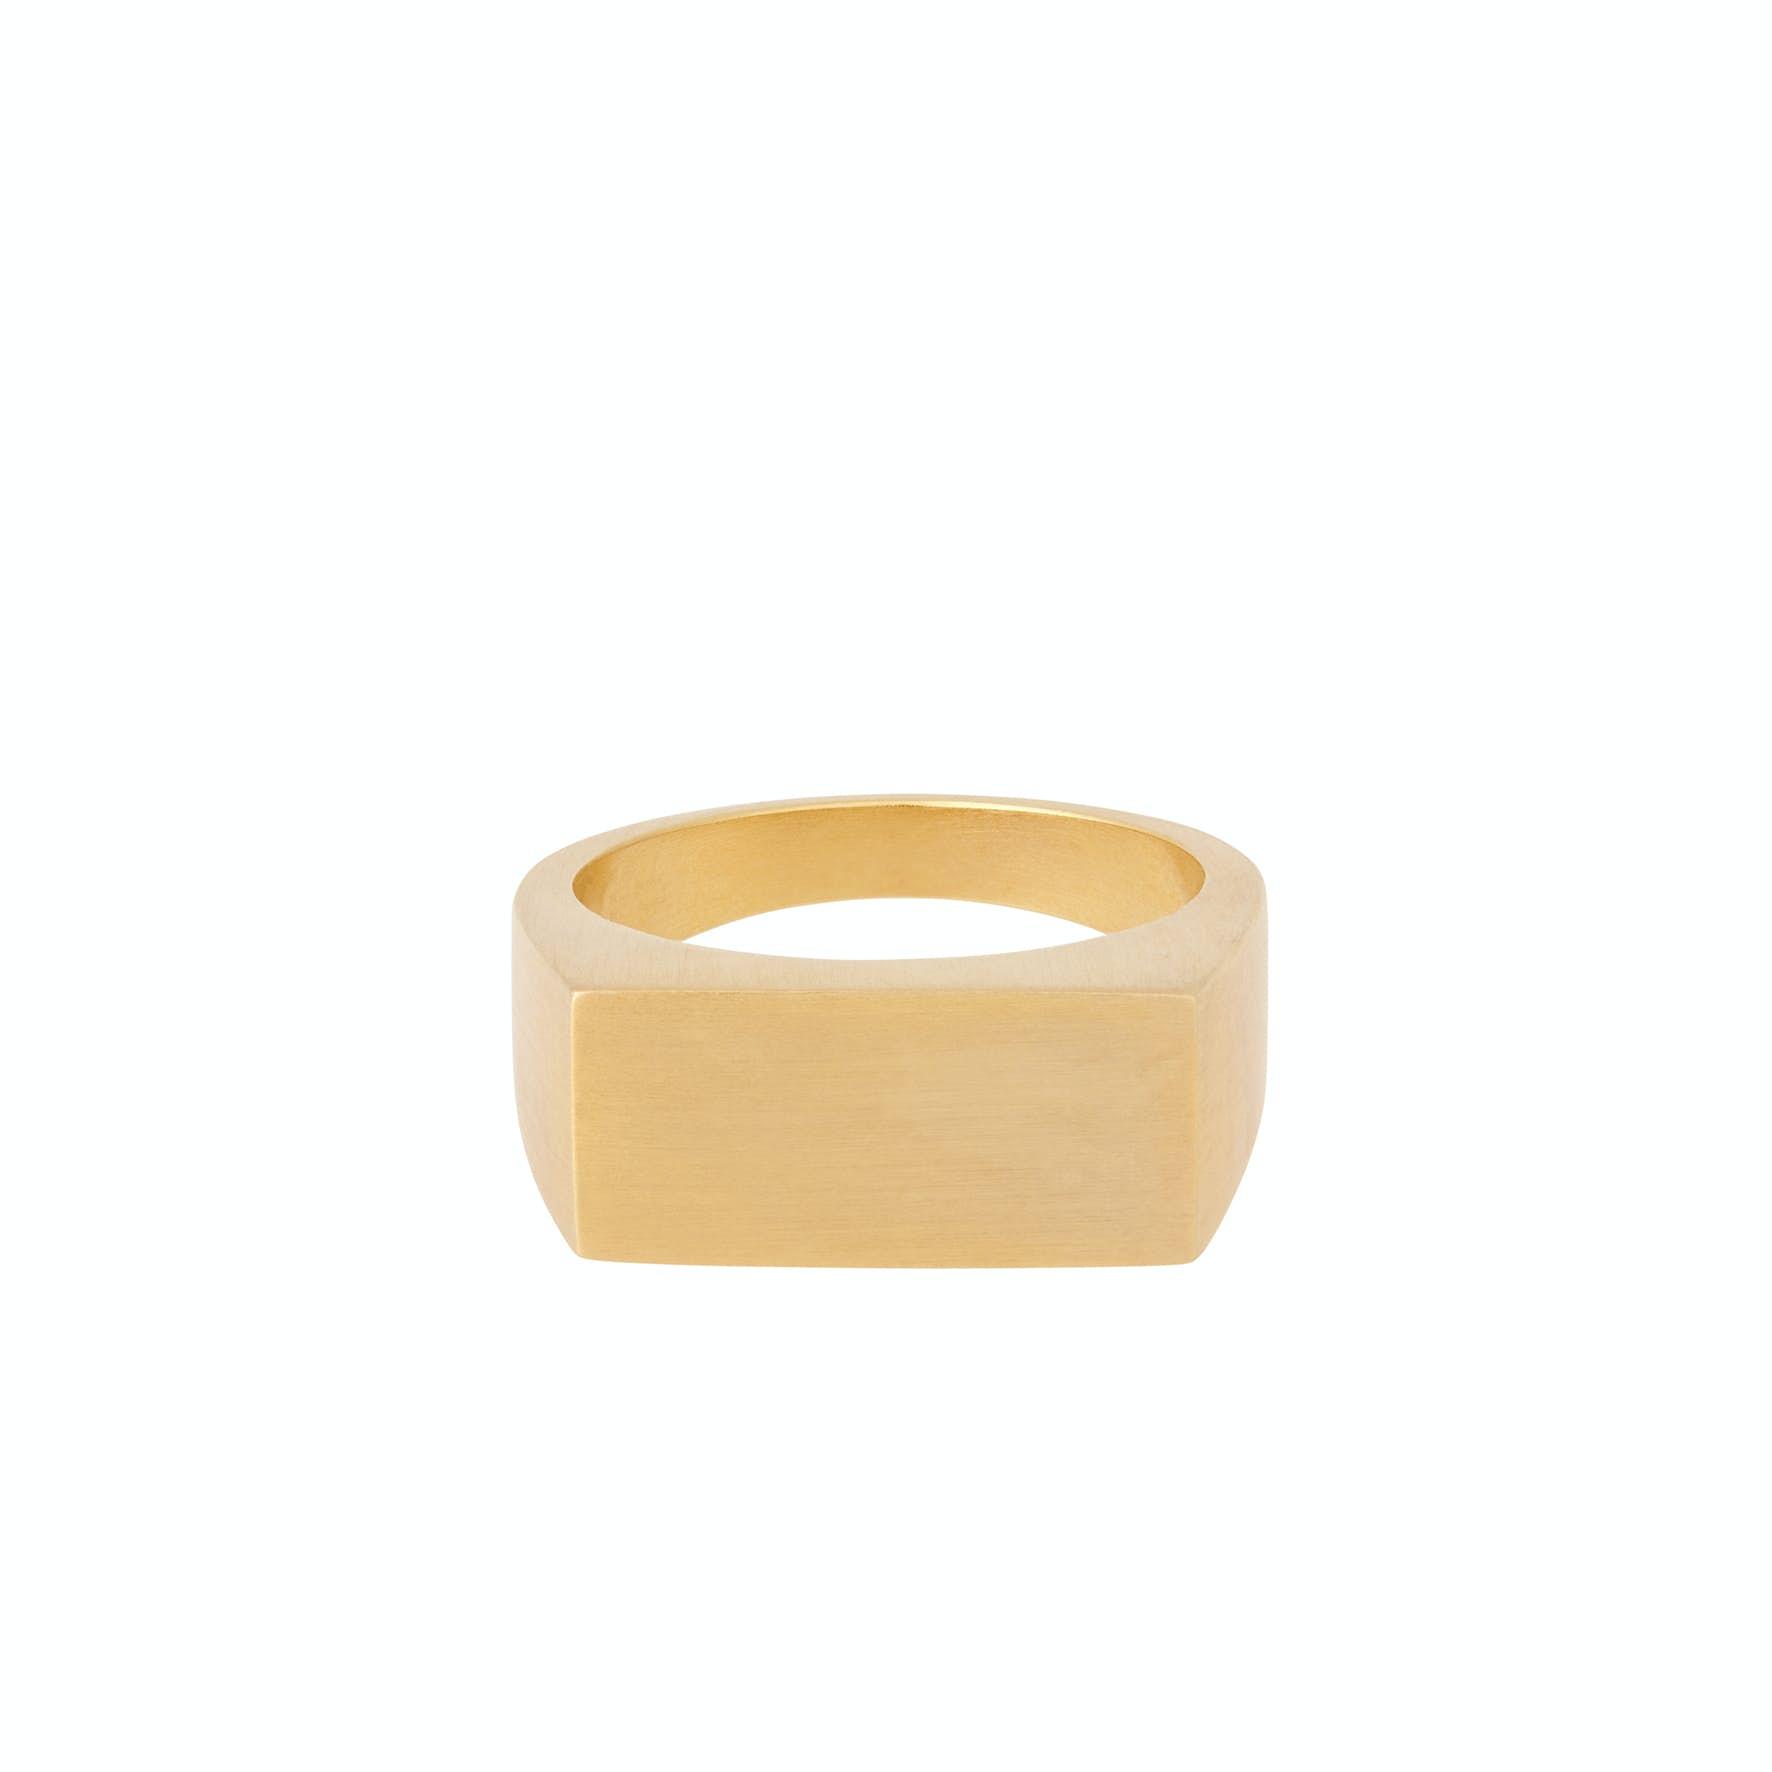 Rock Ring von Pernille Corydon in Vergoldet-Silber Sterling 925